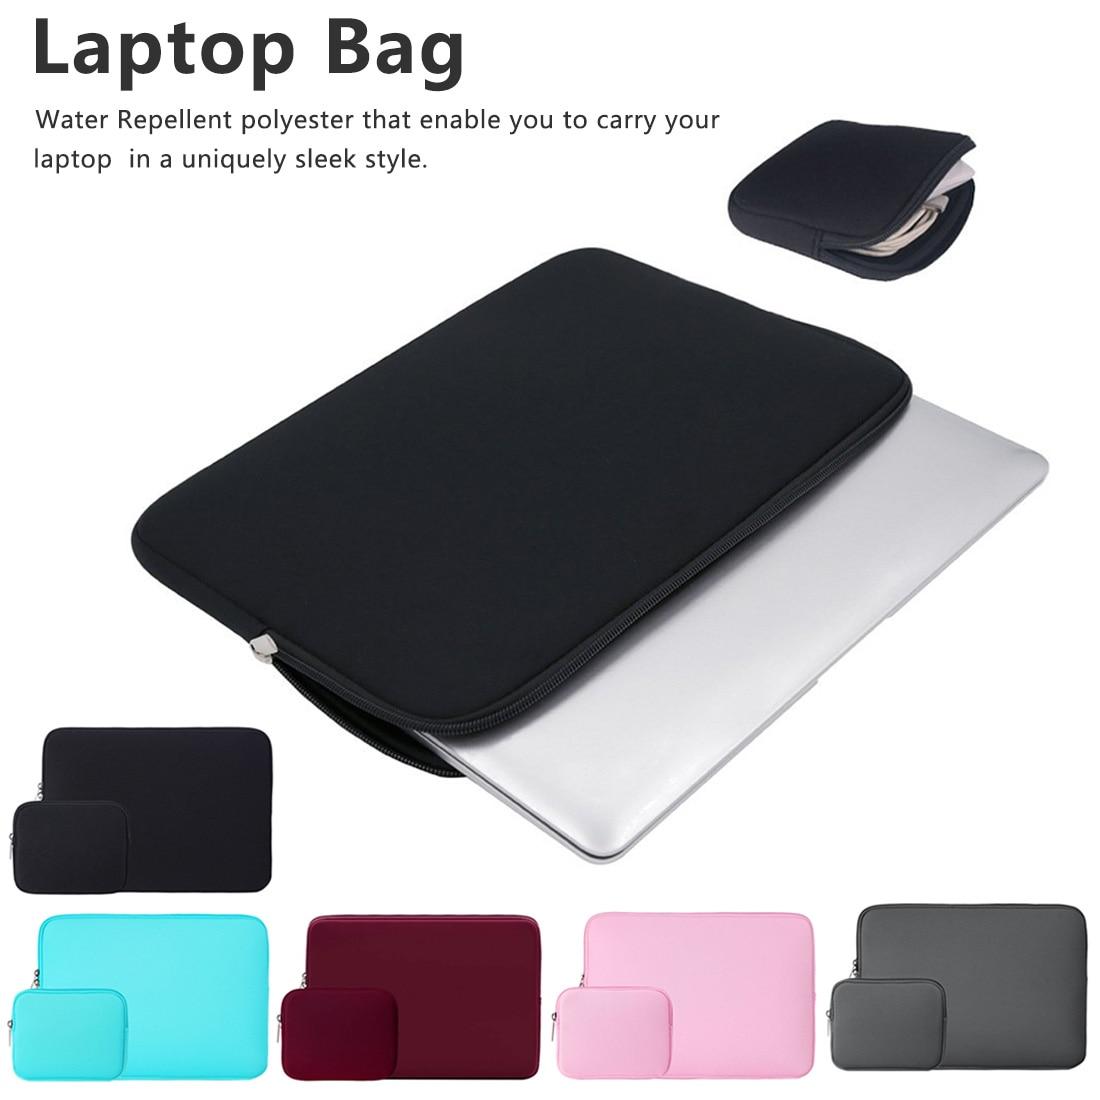 Polyester Neoprene Waterproof Case Waterproof Laptop Case 11''13''14''15''15.6 '' For Lenovo HP Asus